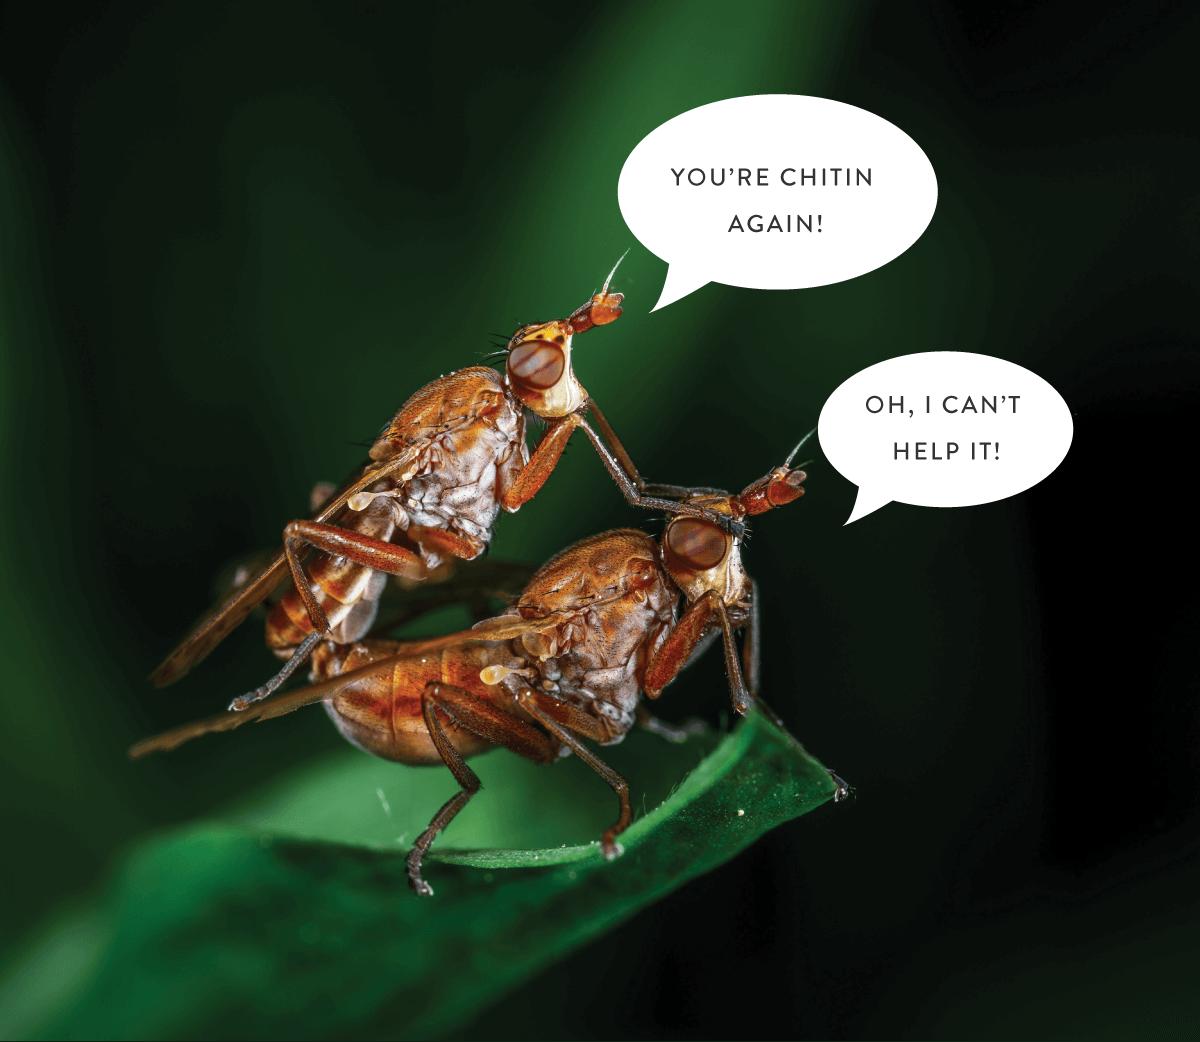 bad fly joke